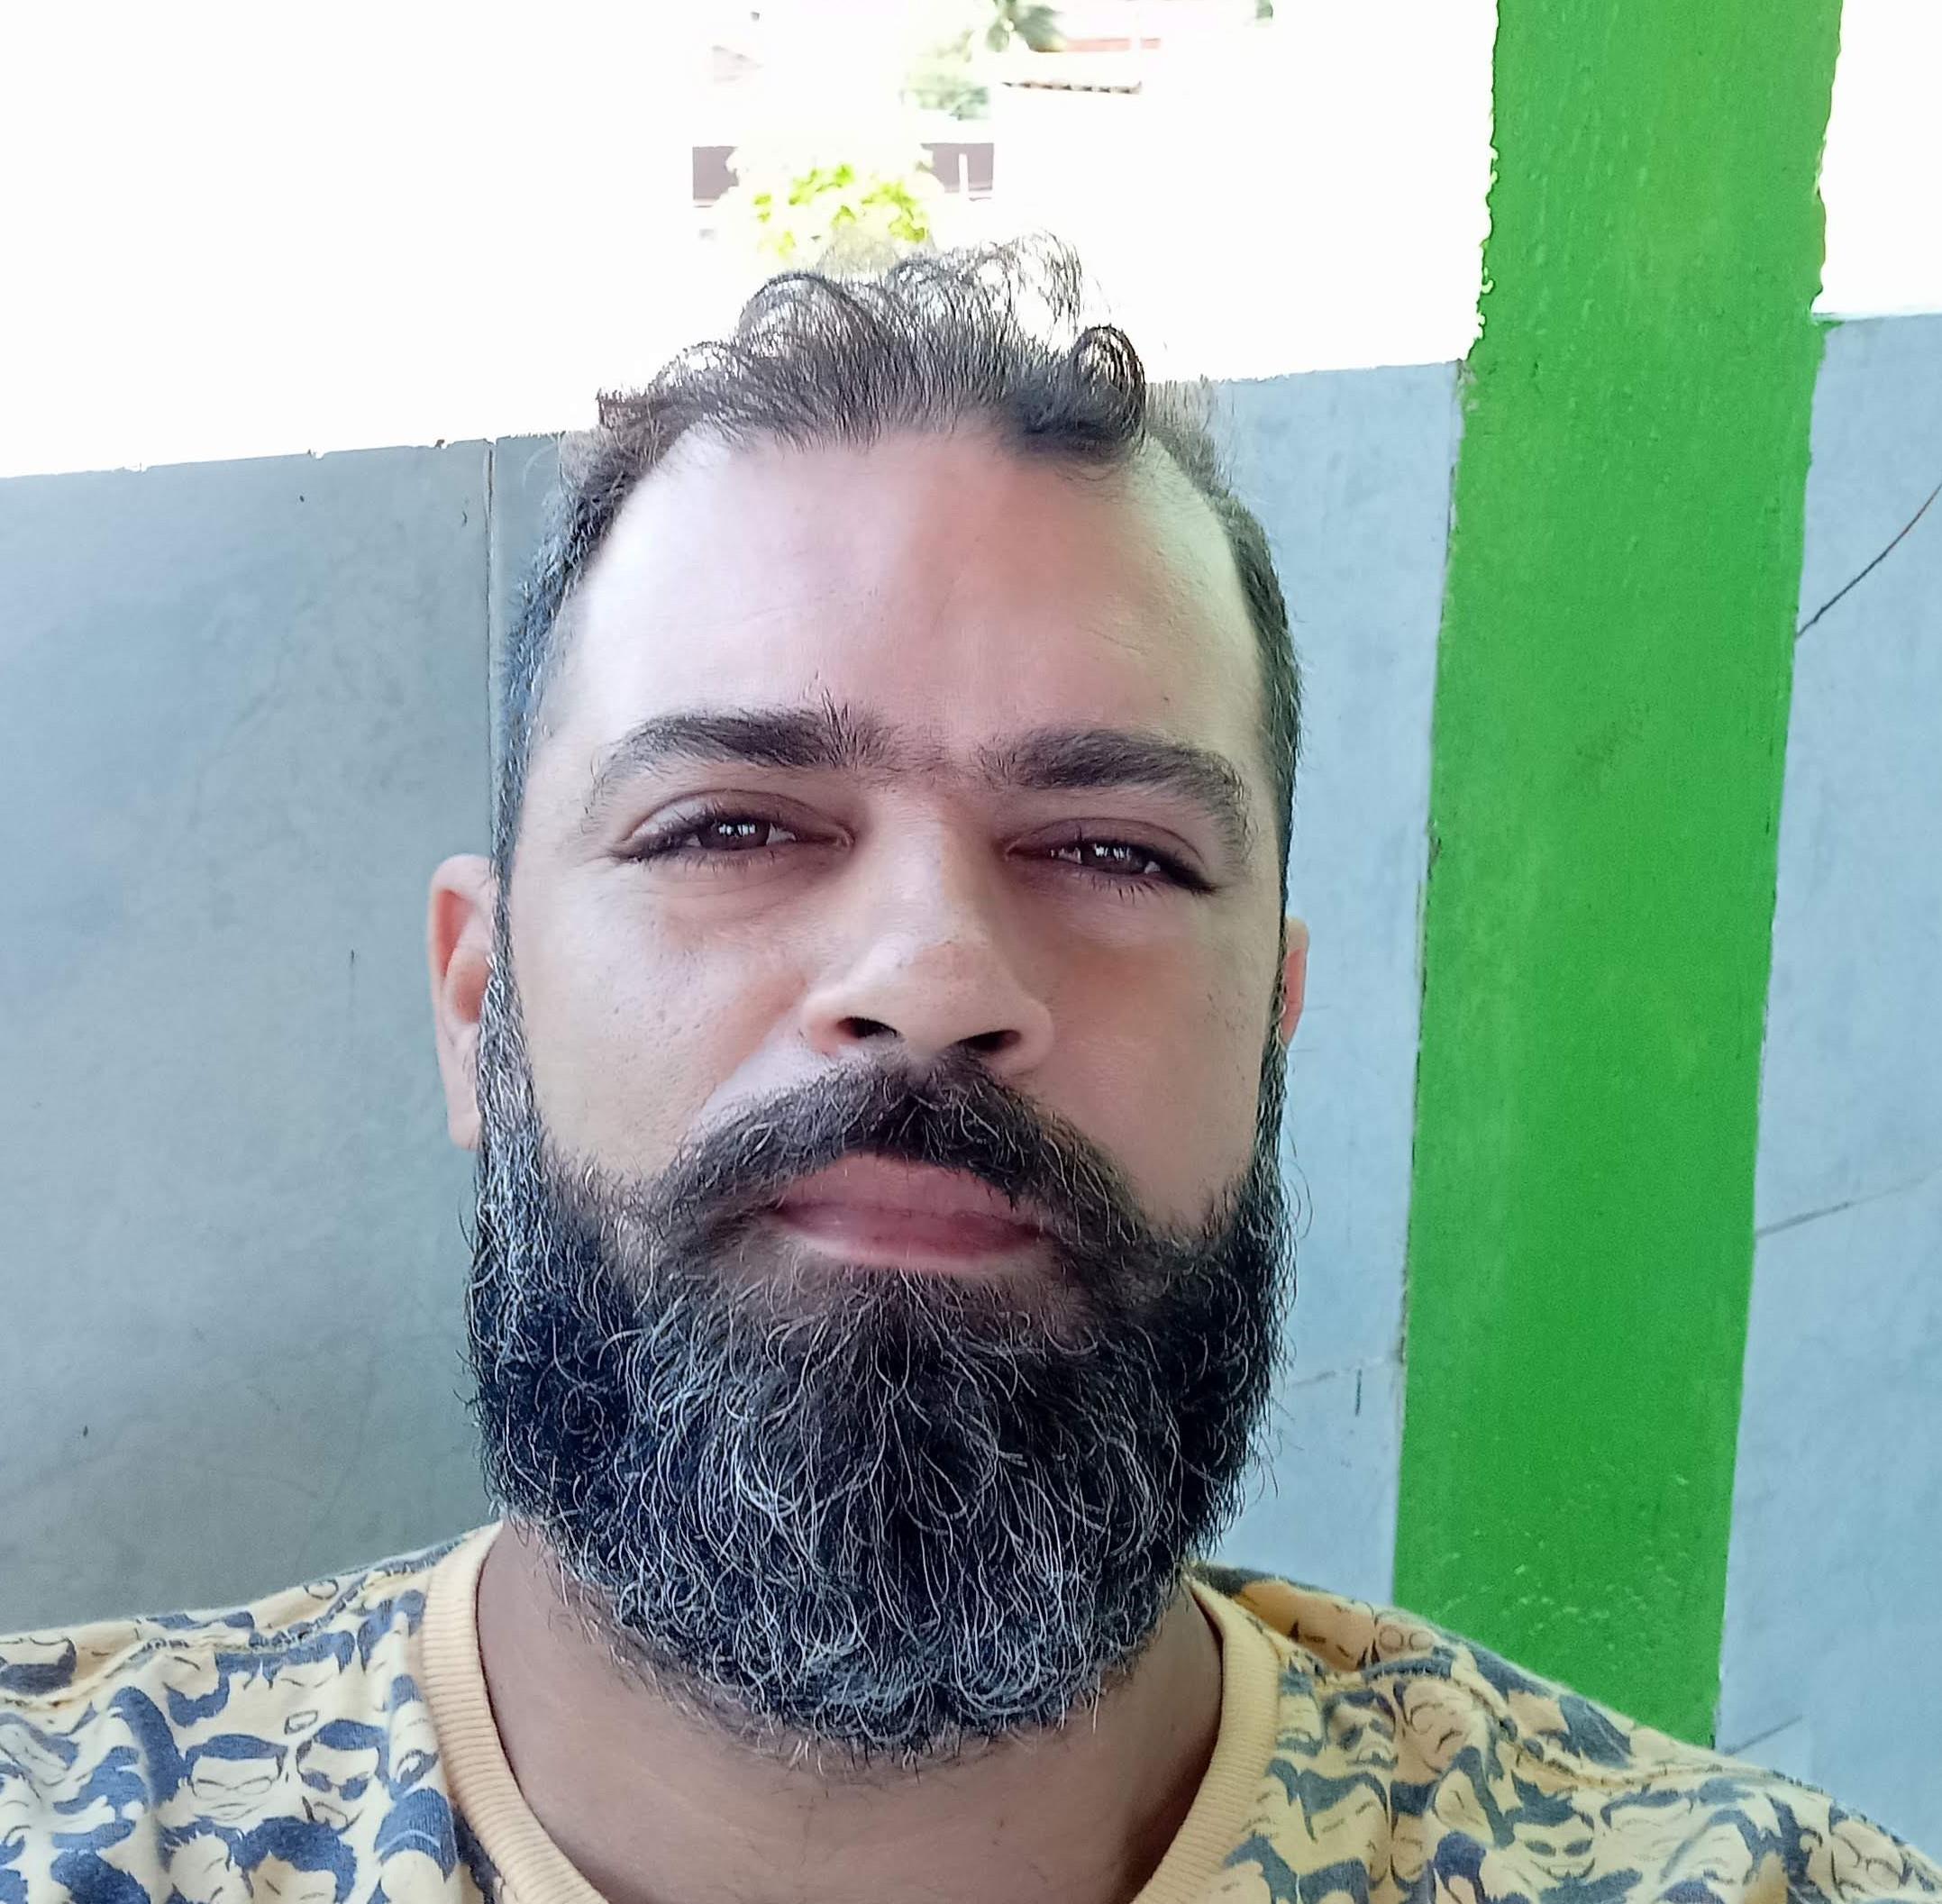 César Gomes